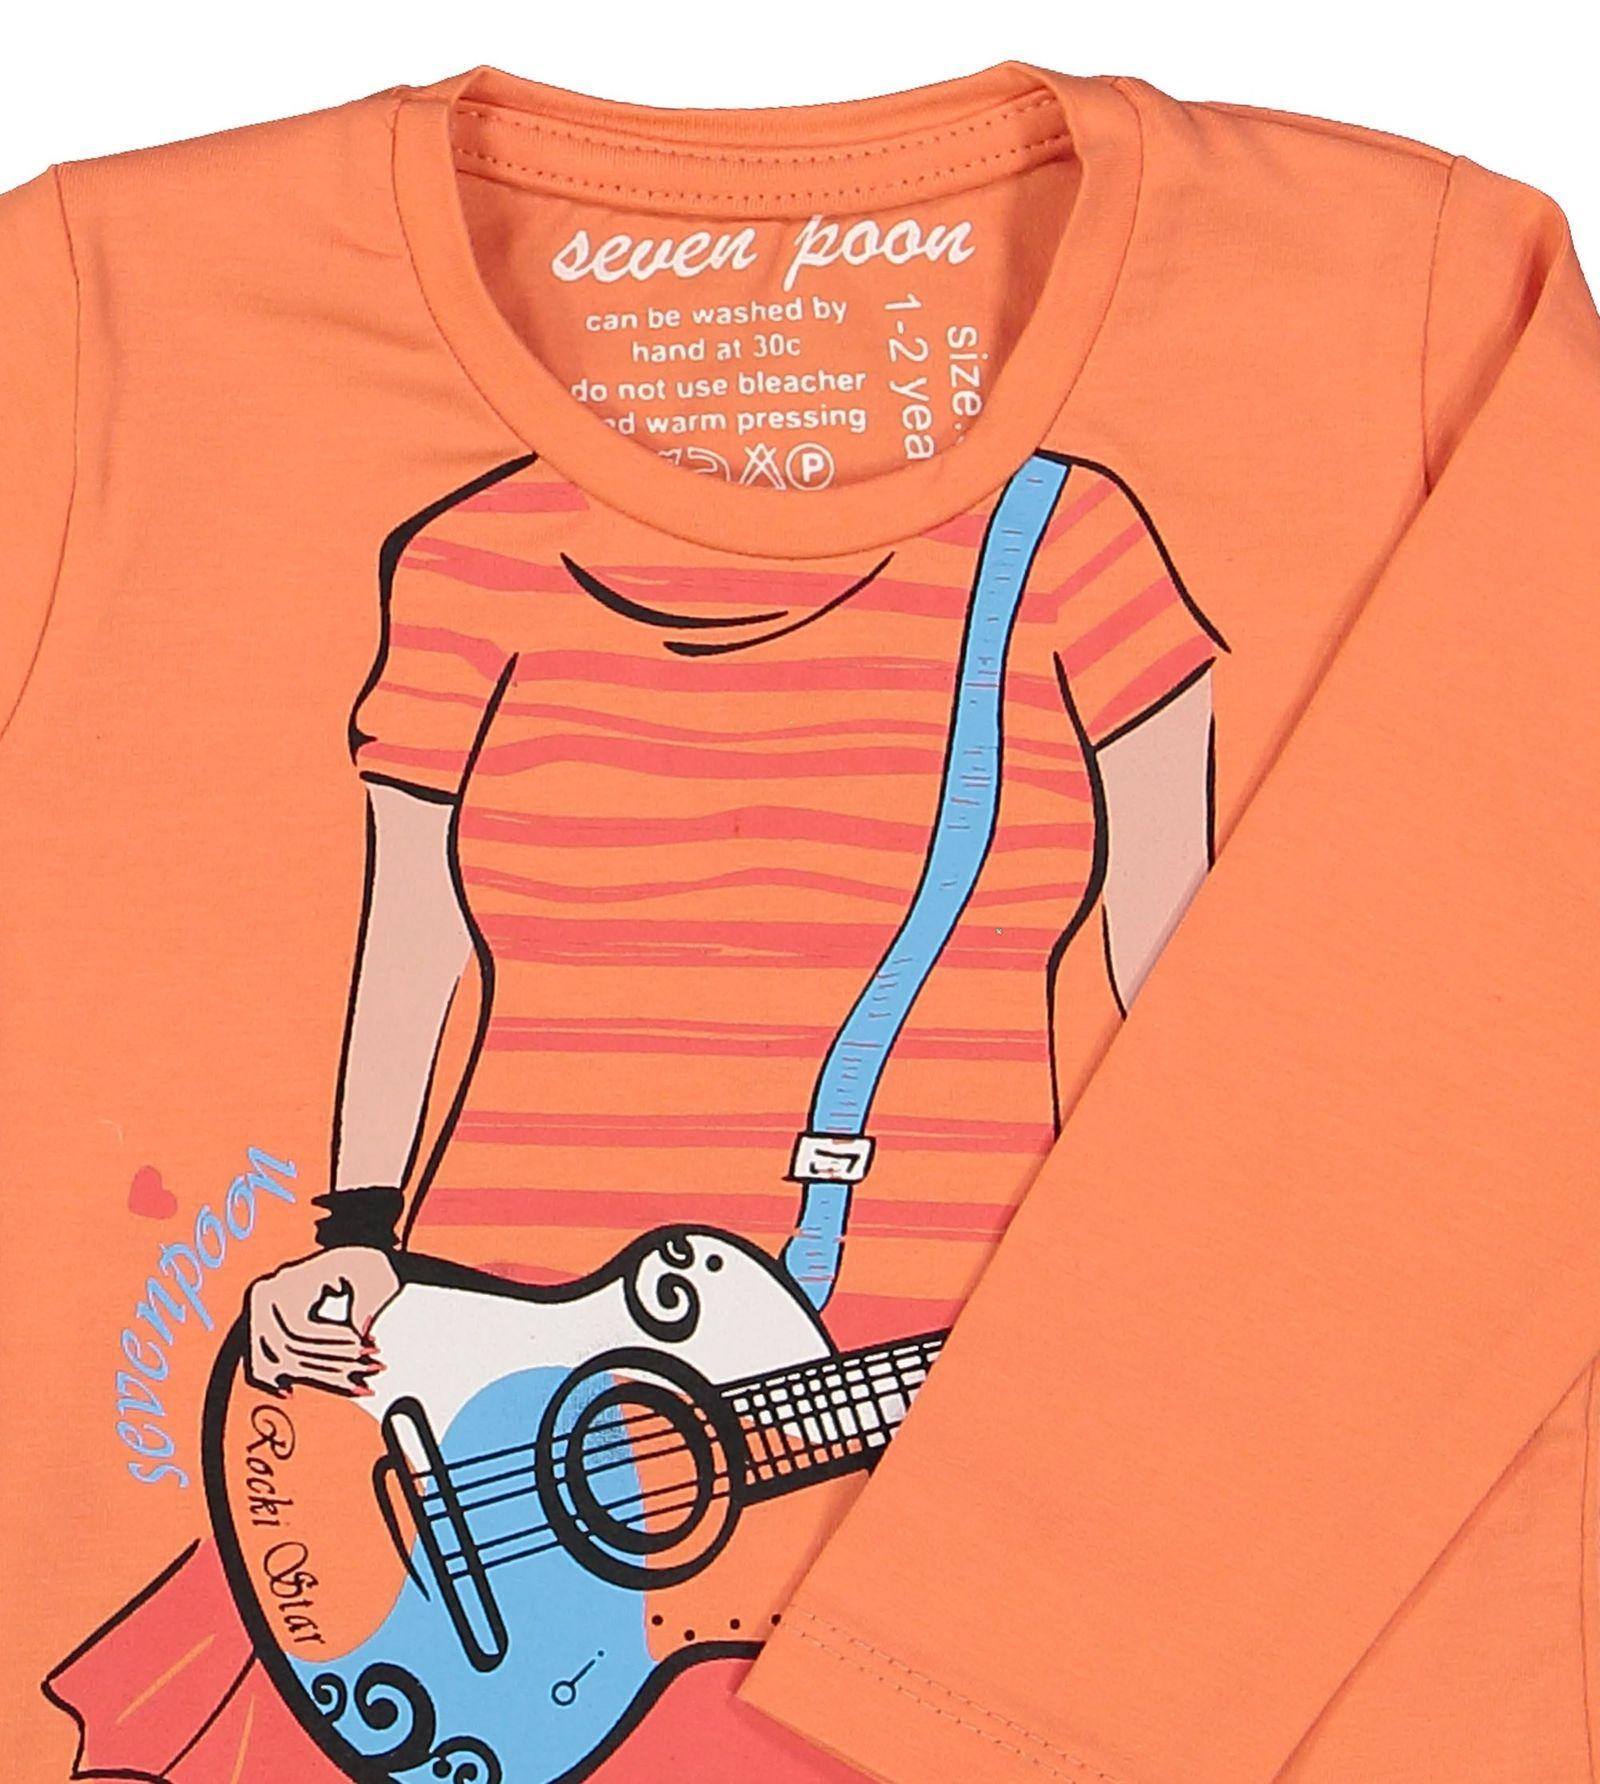 تی شرت نخی یقه گرد دخترانه - سون پون - نارنجی - 3